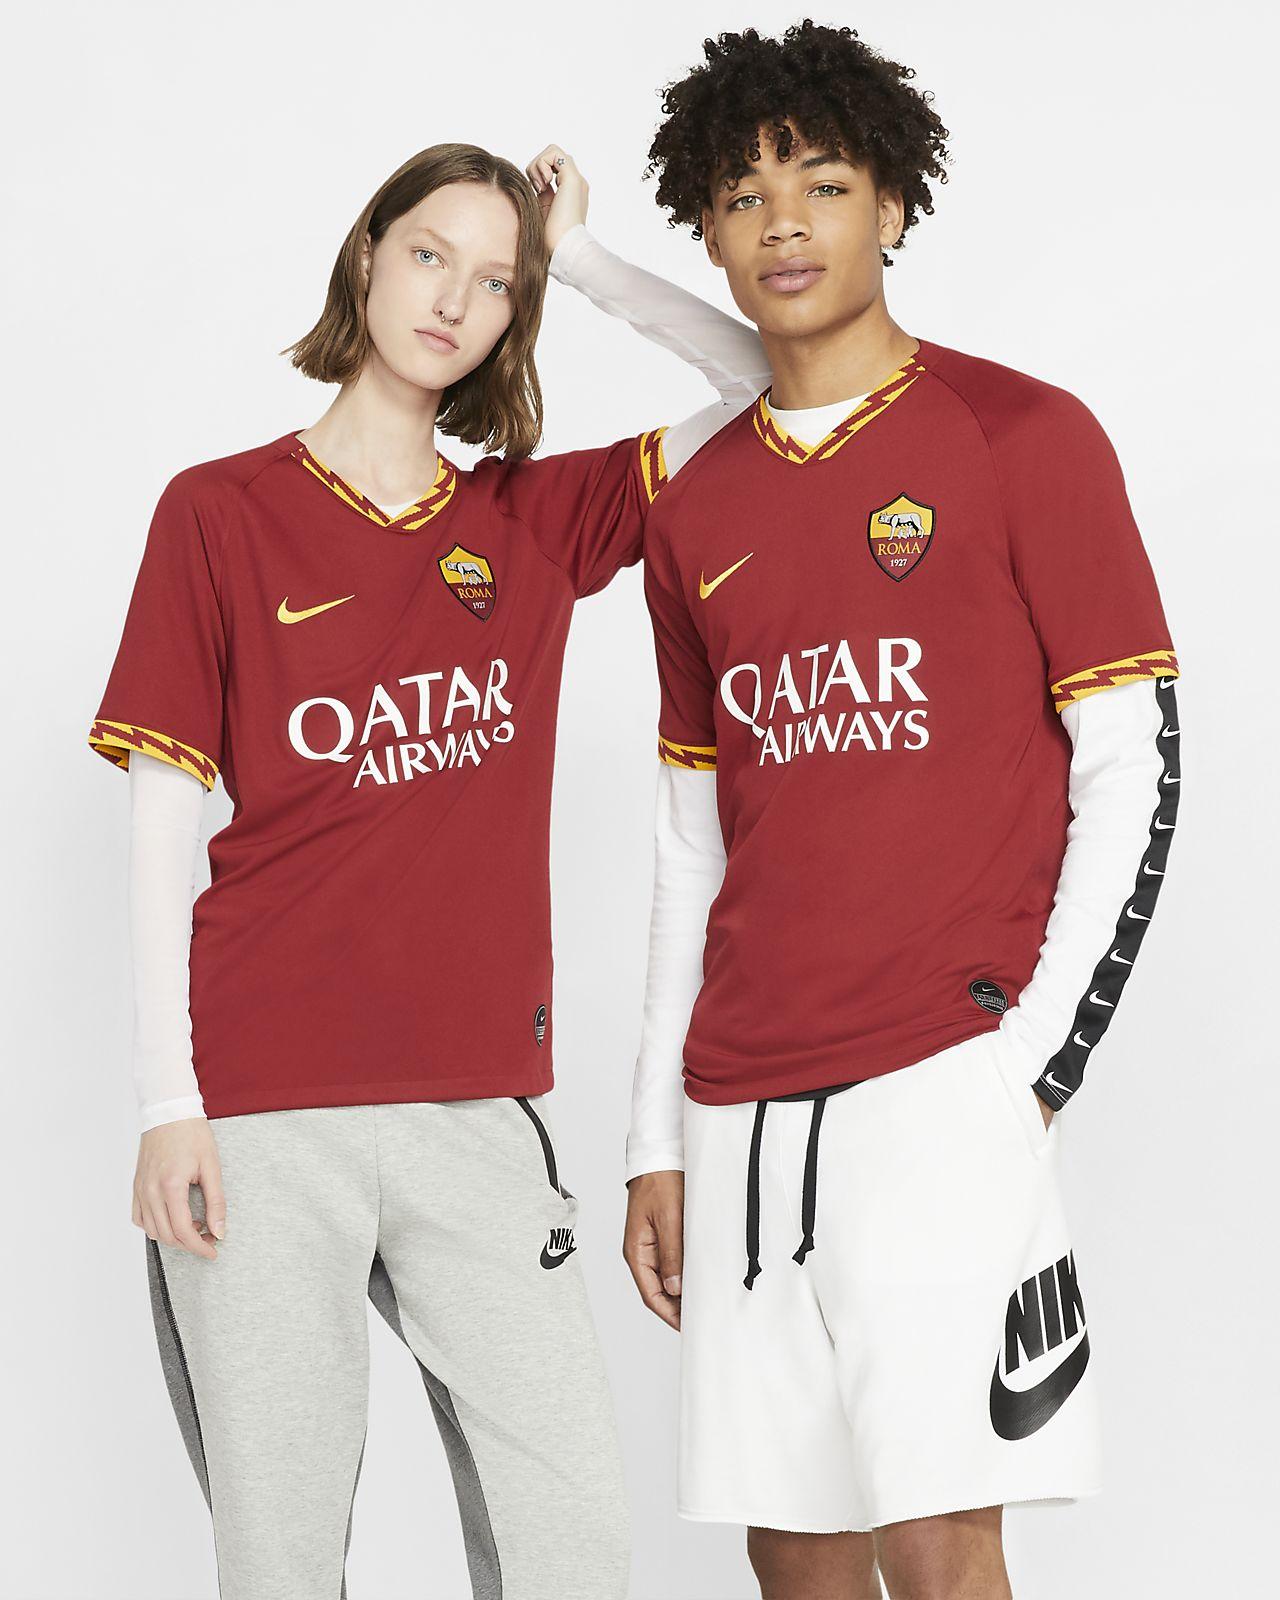 A.S. Roma 2019/20 Stadium Home Football Shirt